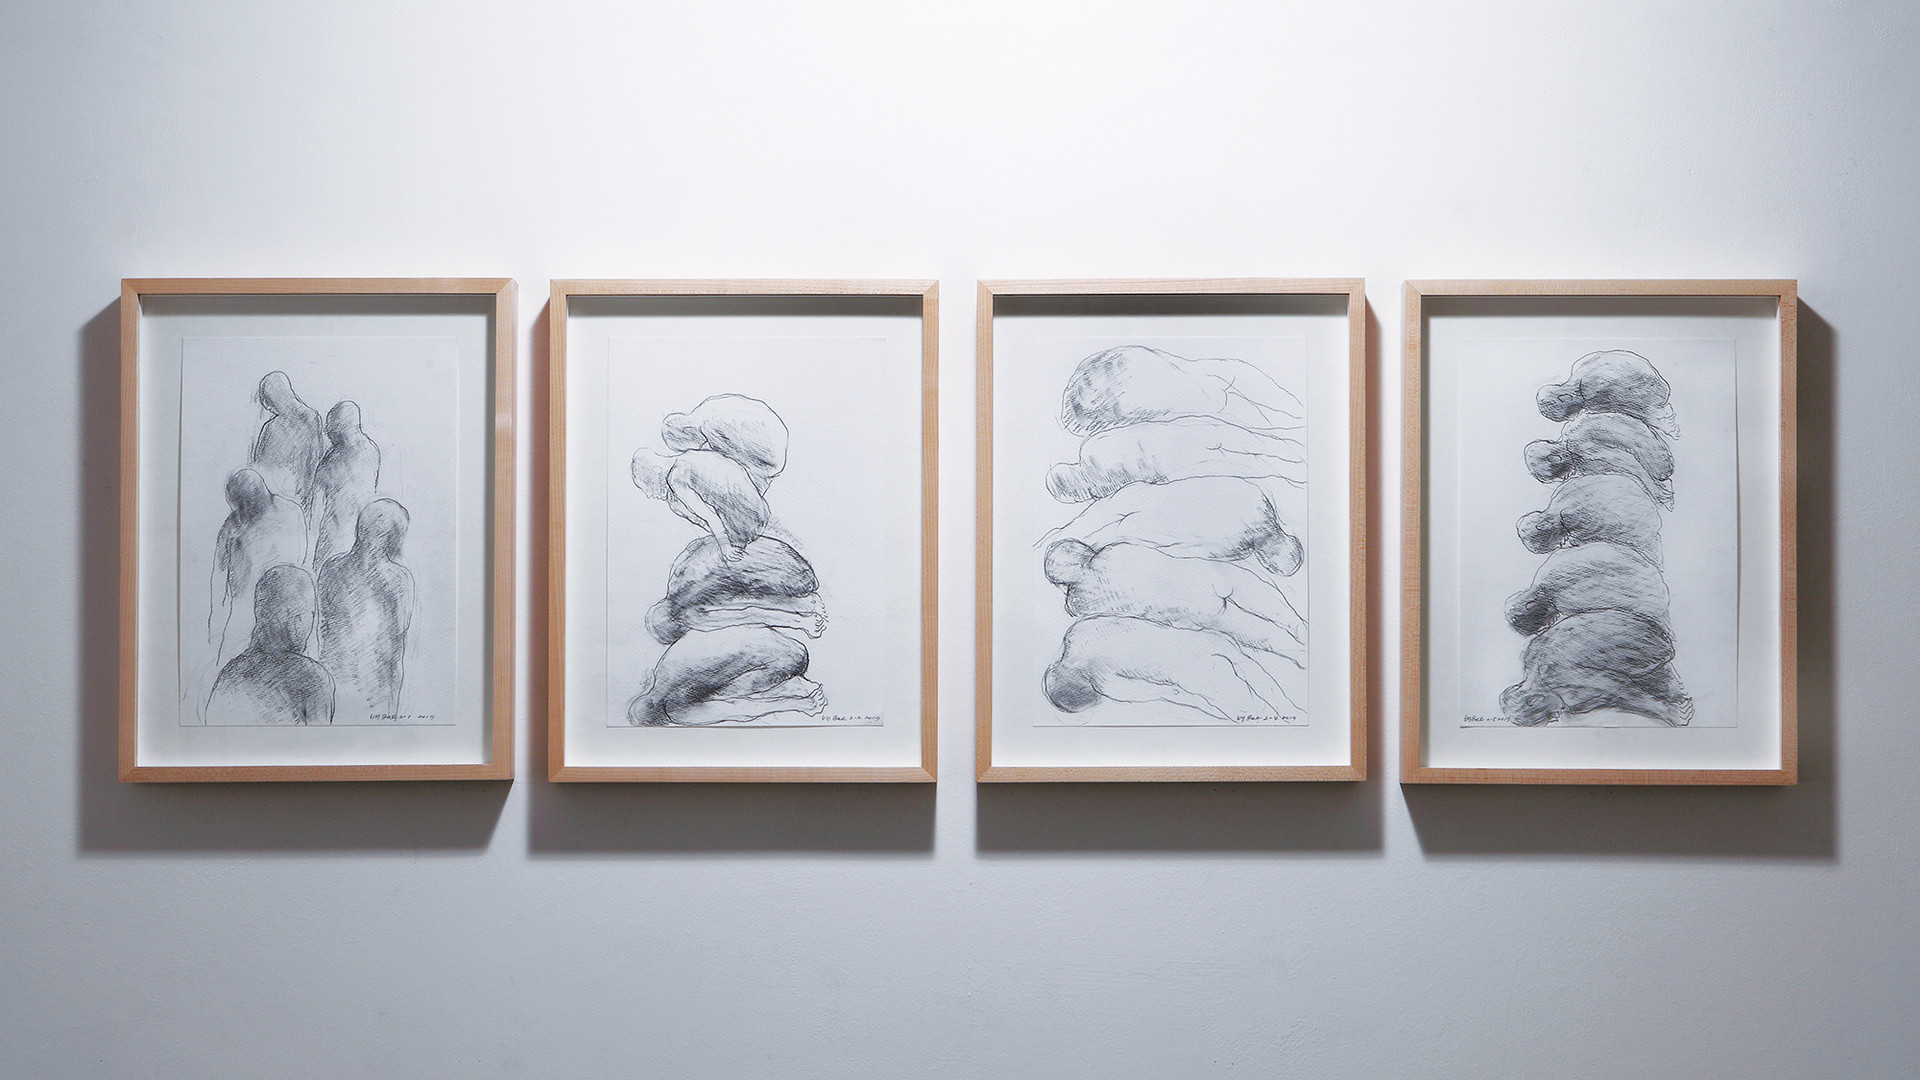 Bae Hyung Kyung, drawing, 2017, pencil on paper, 29.5x38cm each